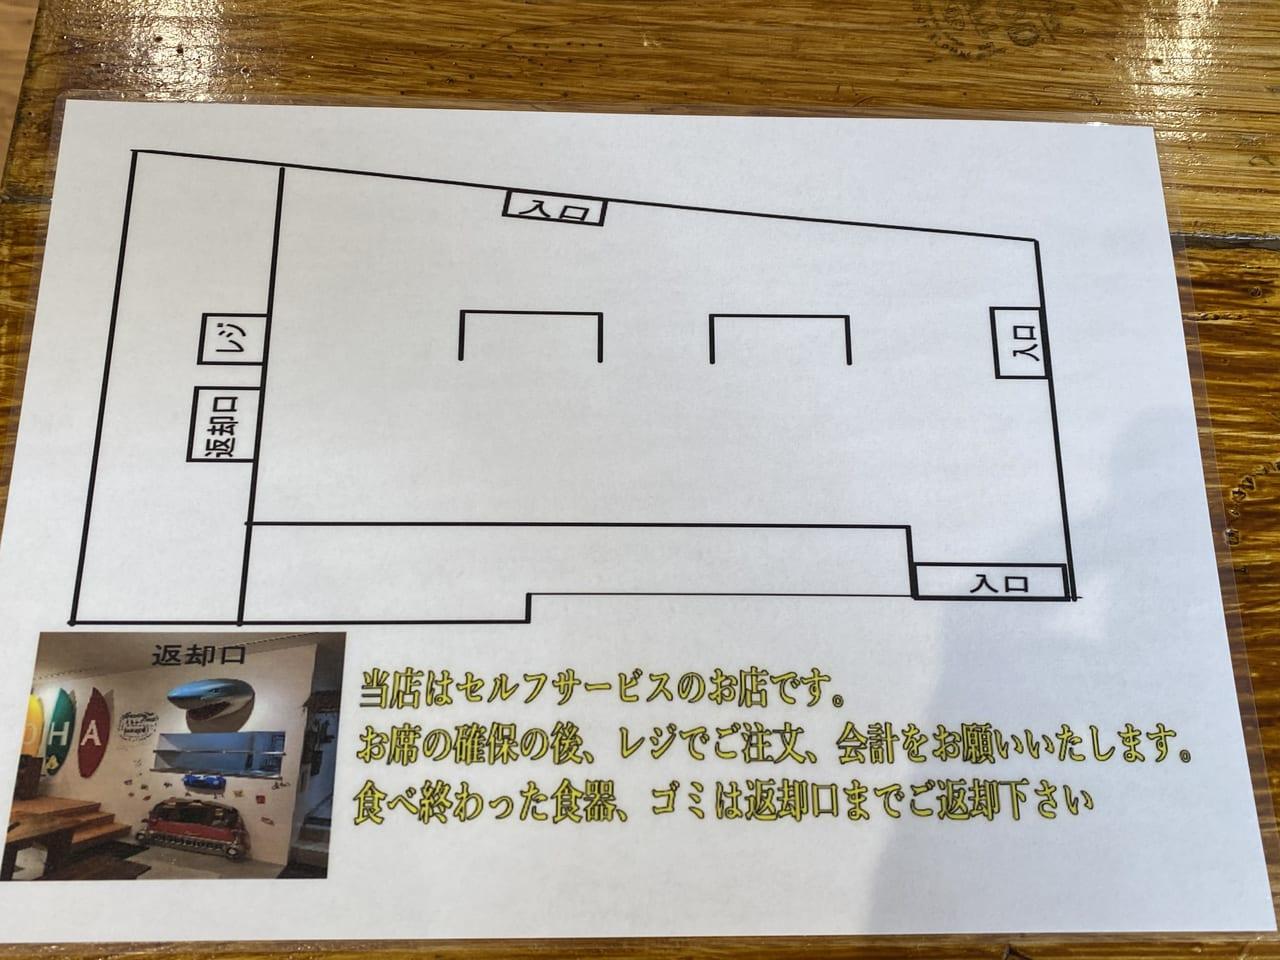 http://www.kaupili.jp/